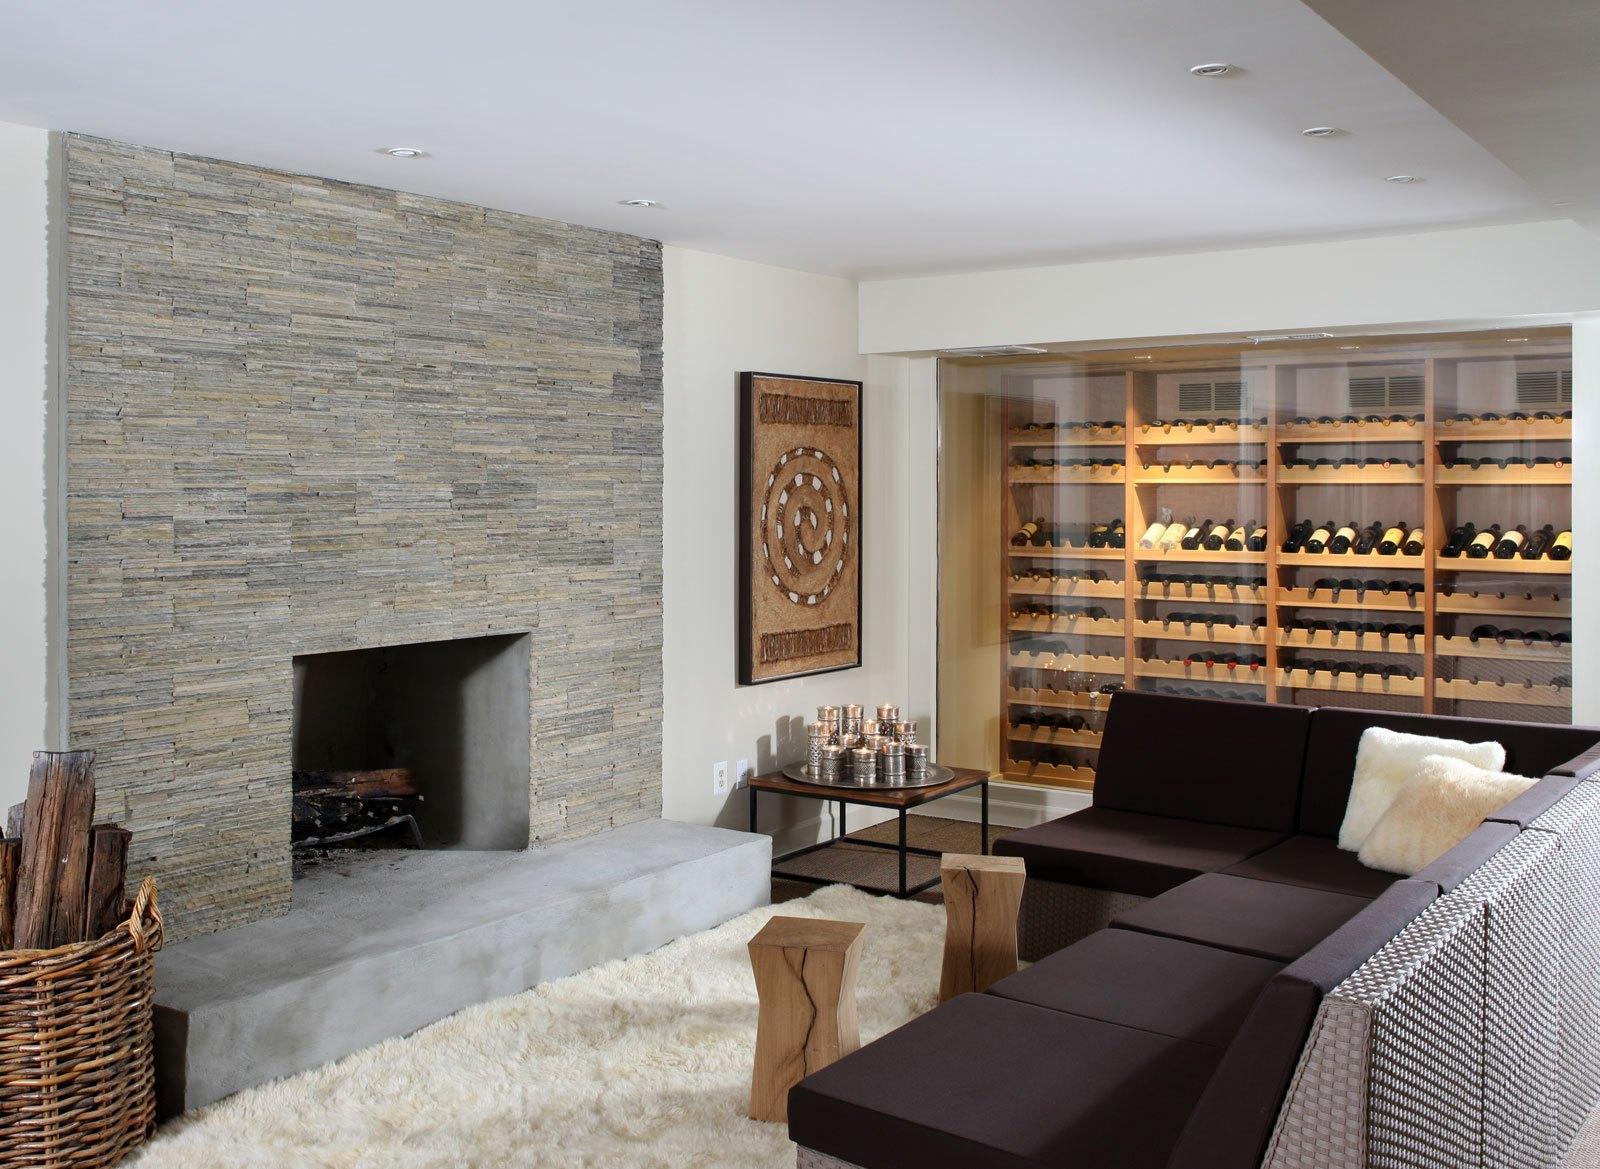 Wall Wine Rack High Designed Bottles, Wine Rack Ideas Living Room